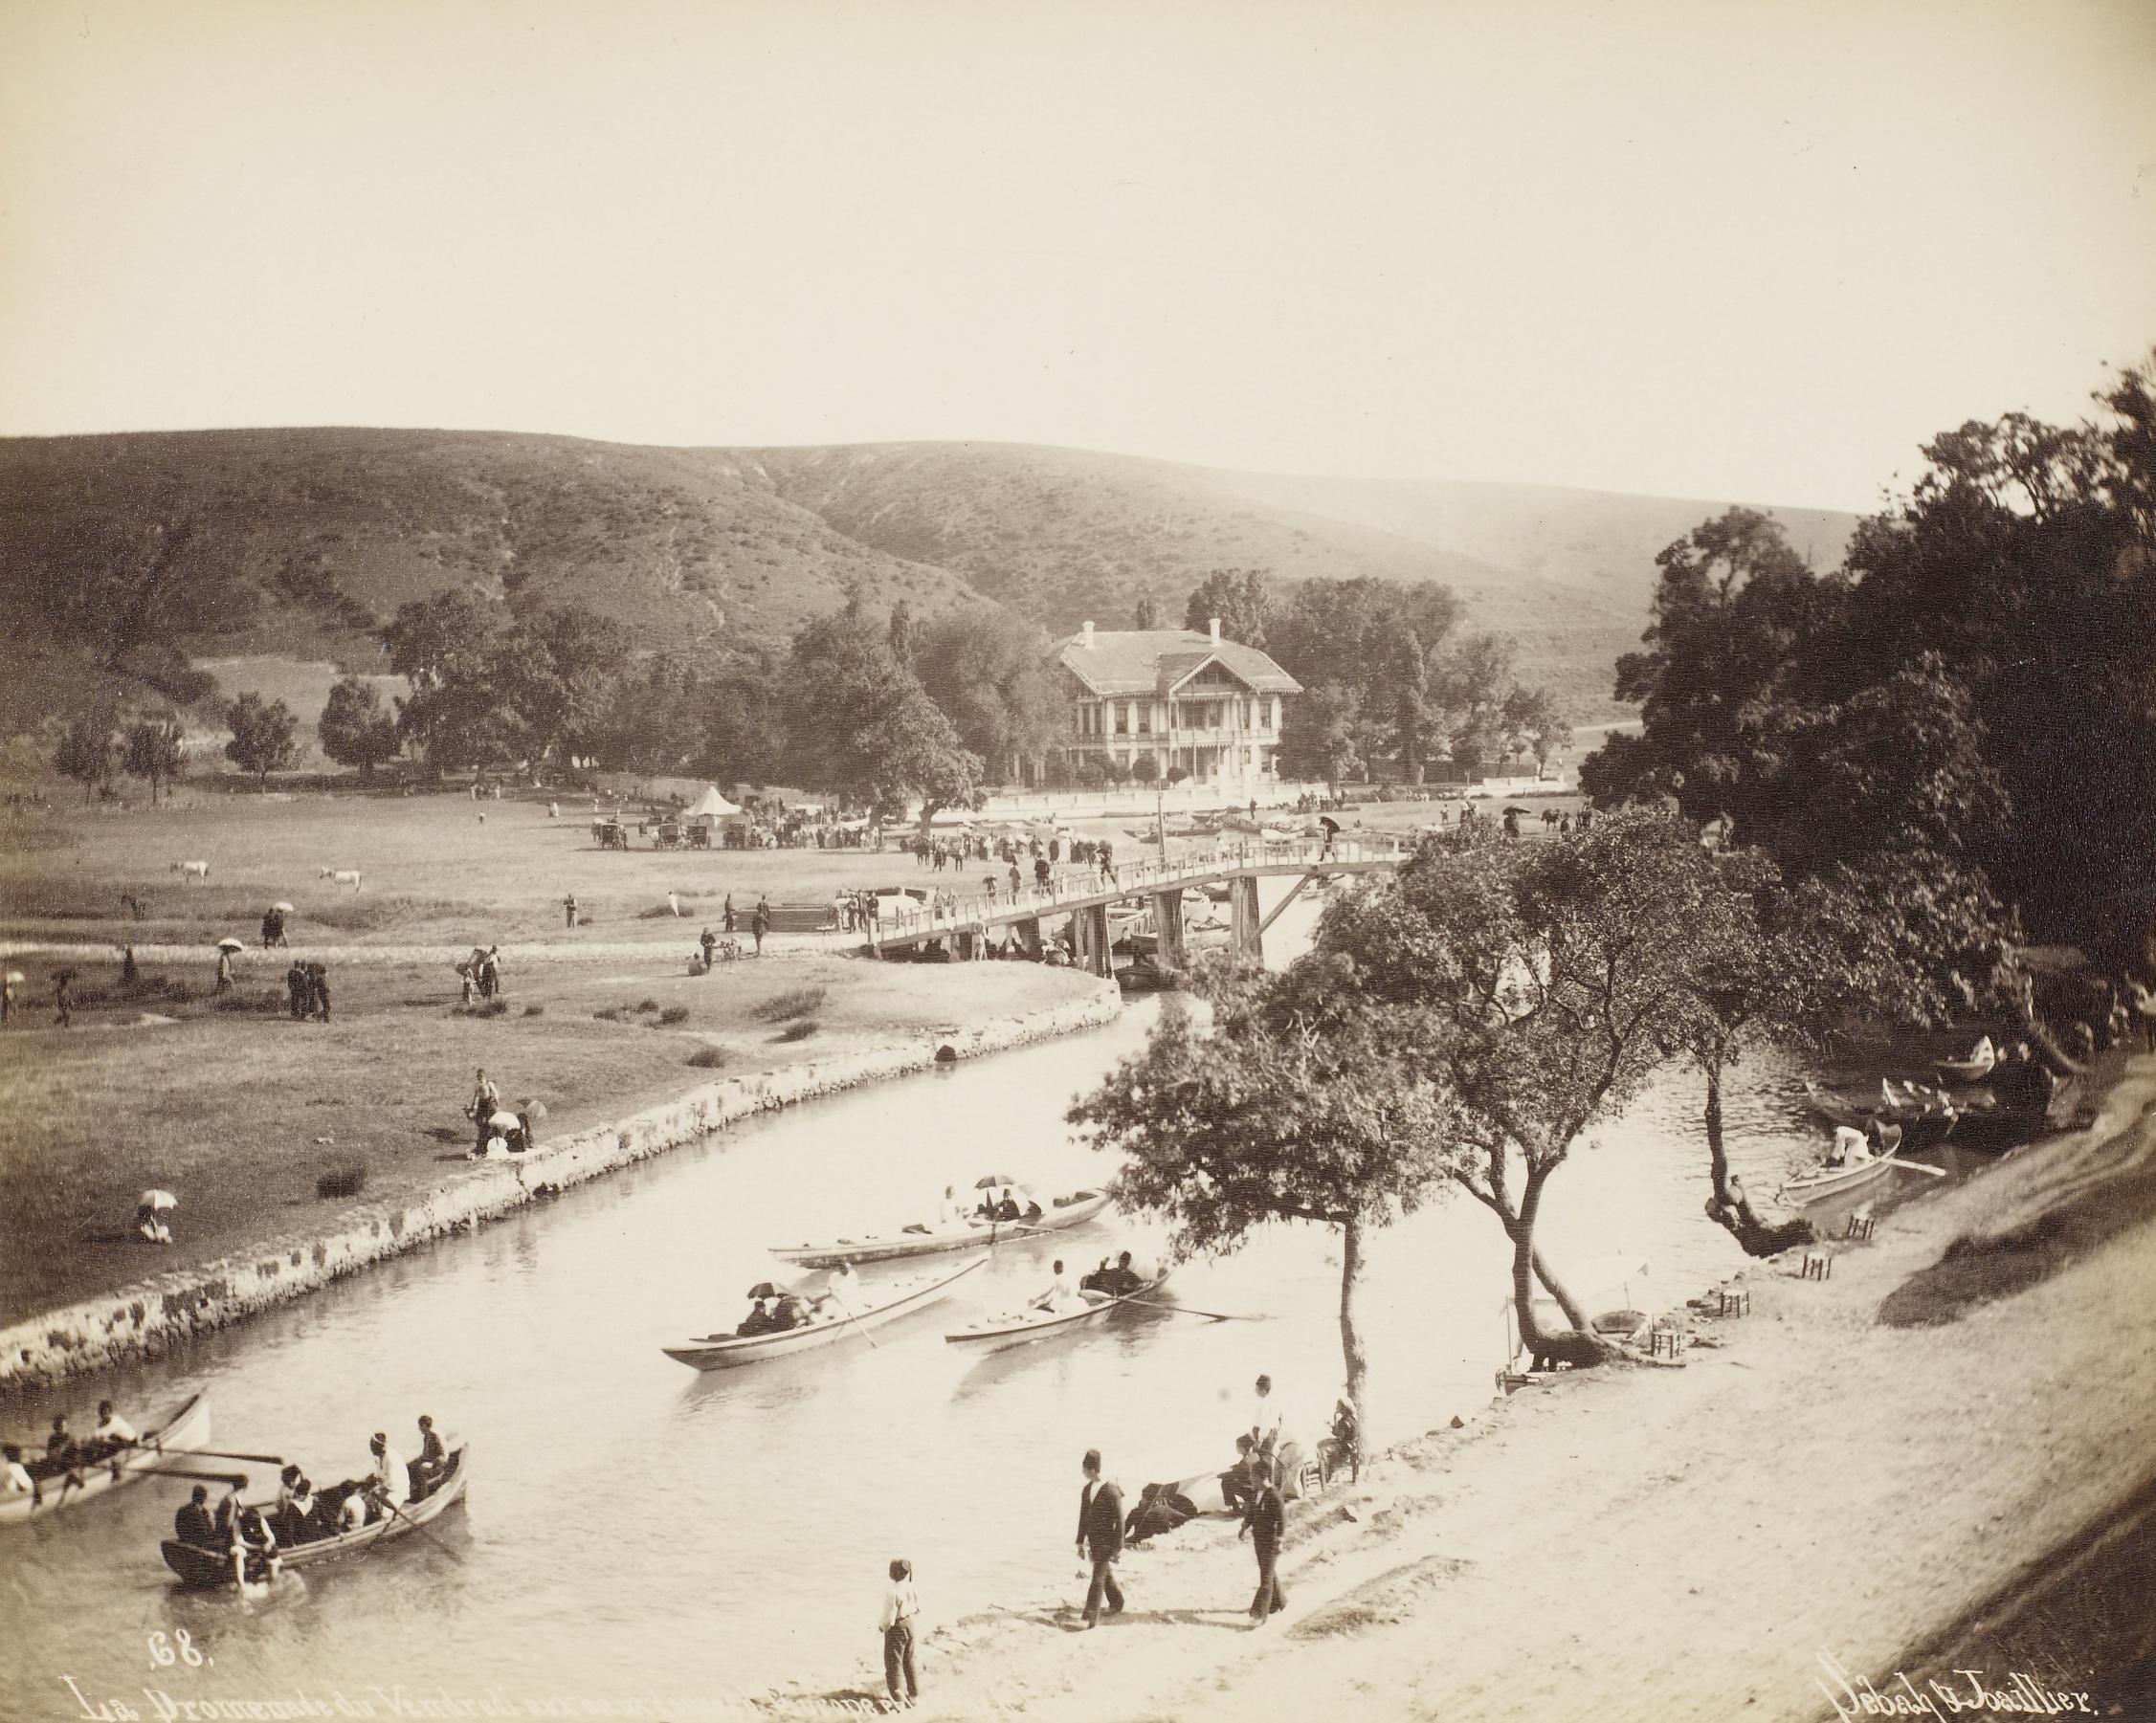 Kağıthane Valley. Photograph by Jean Pascal Sébah (1872–1947), c. 1884–1905. Public domain.